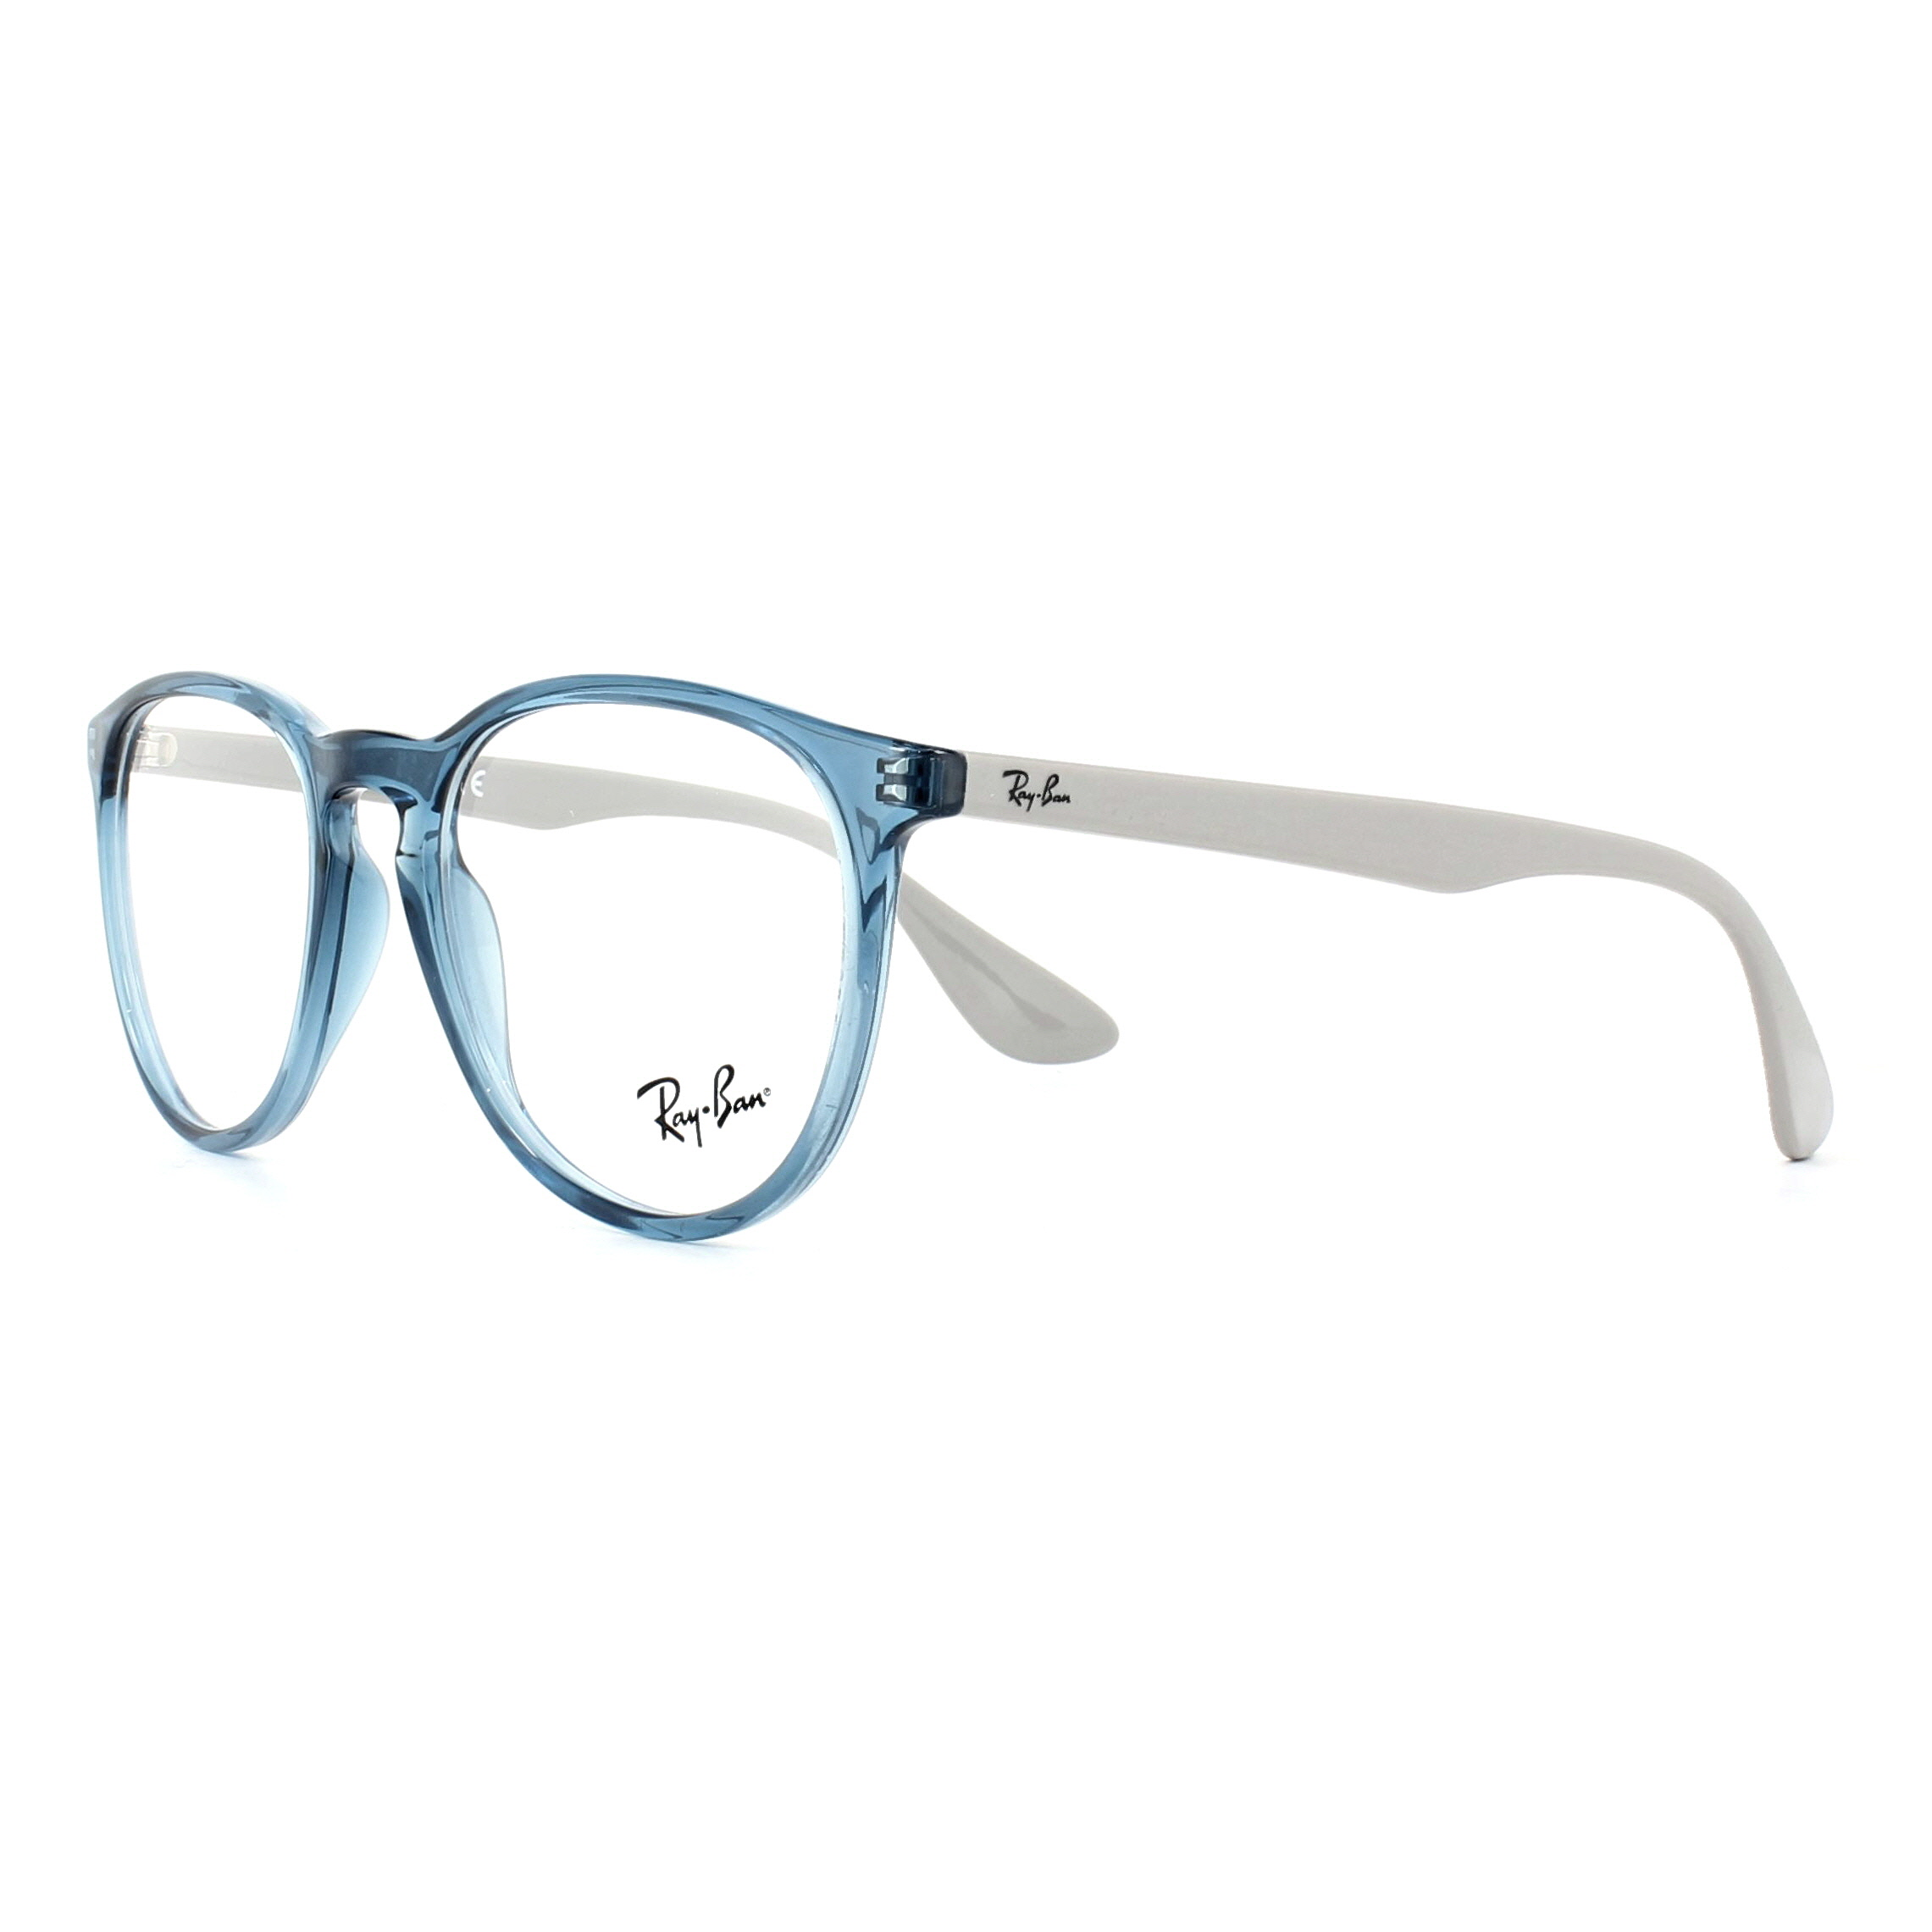 22e116e53c Sentinel Ray-Ban Glasses Frames 7046 Erika 5732 Transparent Blue 51mm Womens